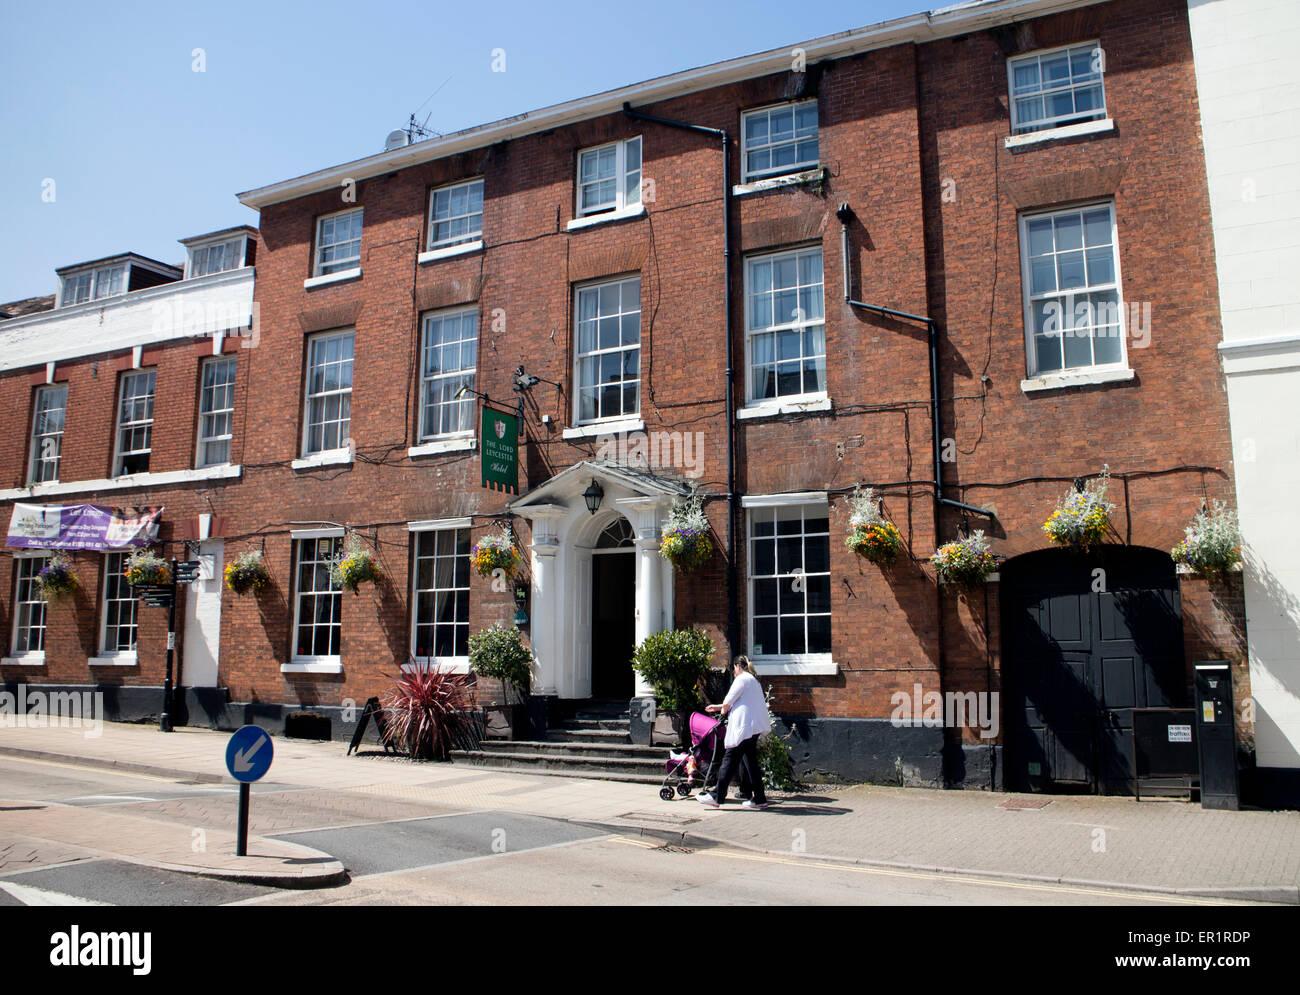 The Lord Leycester Hotel, Warwick, Warwickshire, England, UK